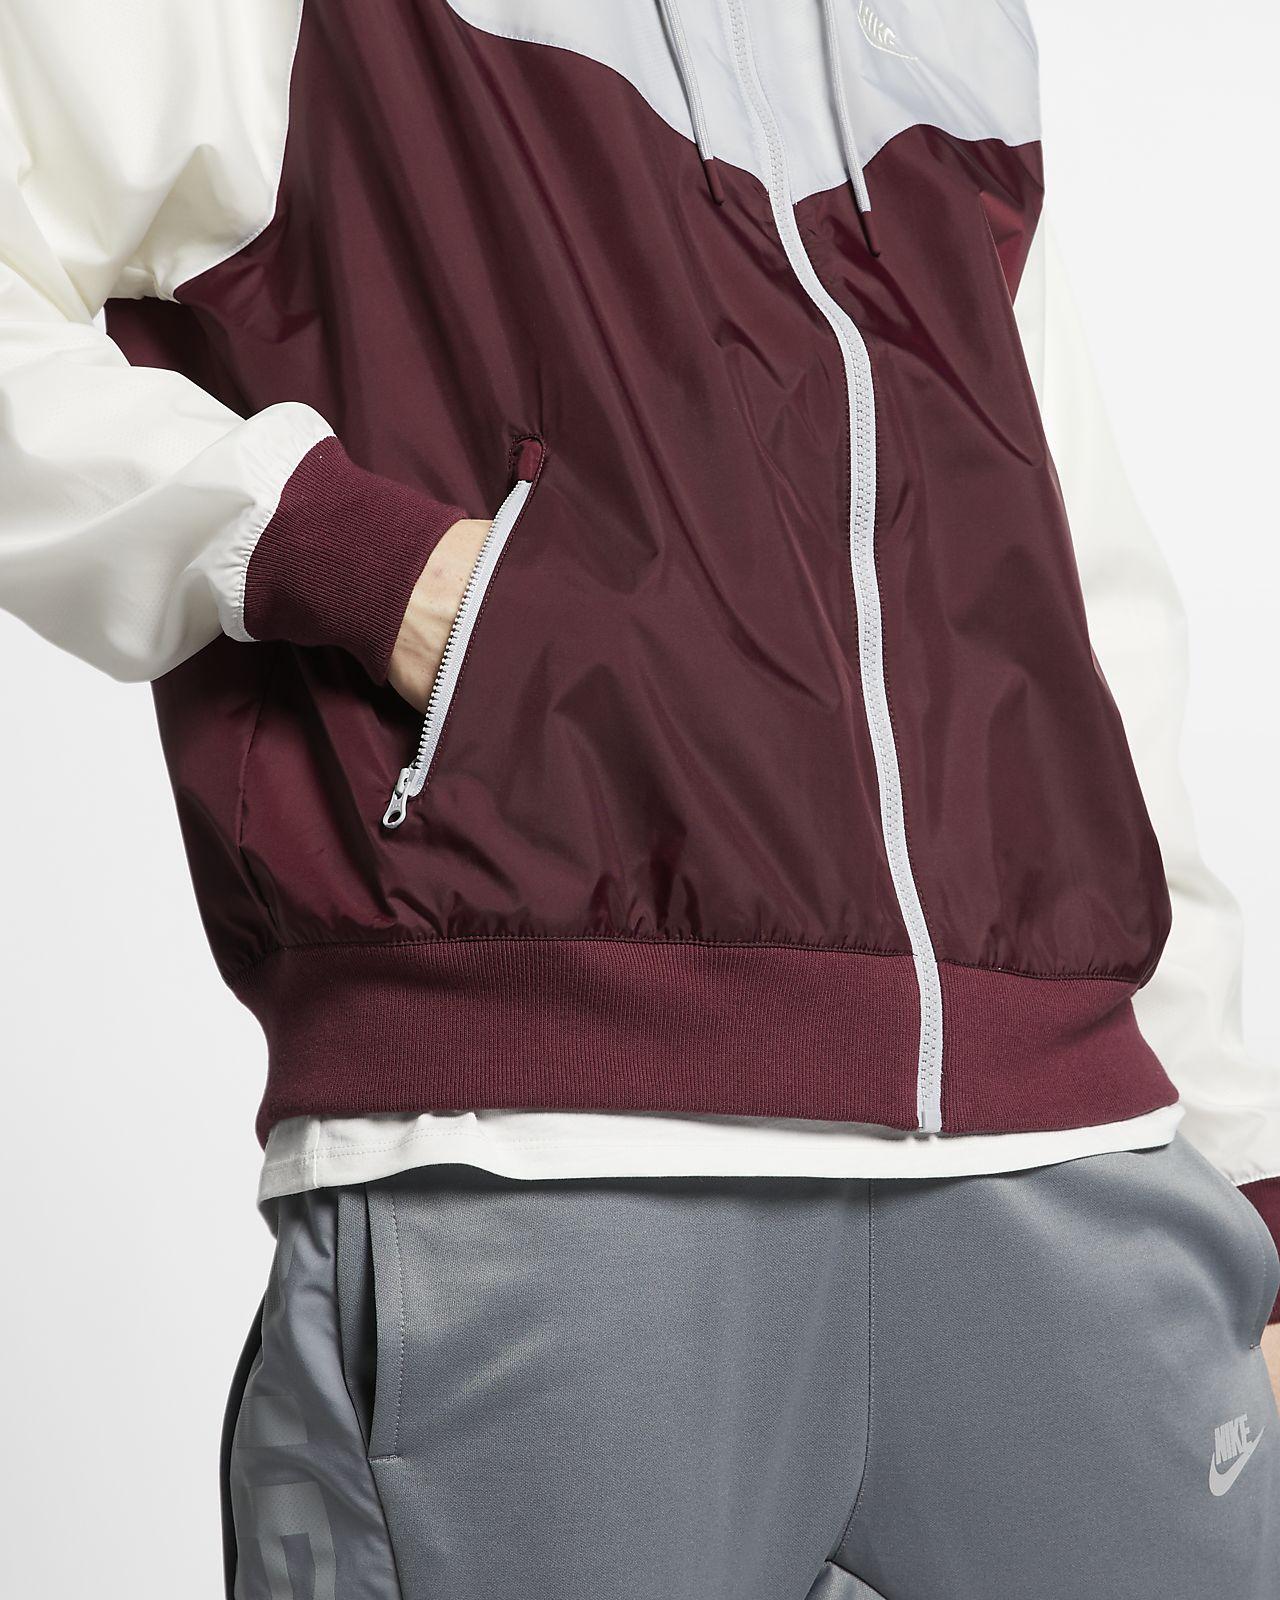 Nike Sportswear Windrunner Night MaroonWolf GreySailSail